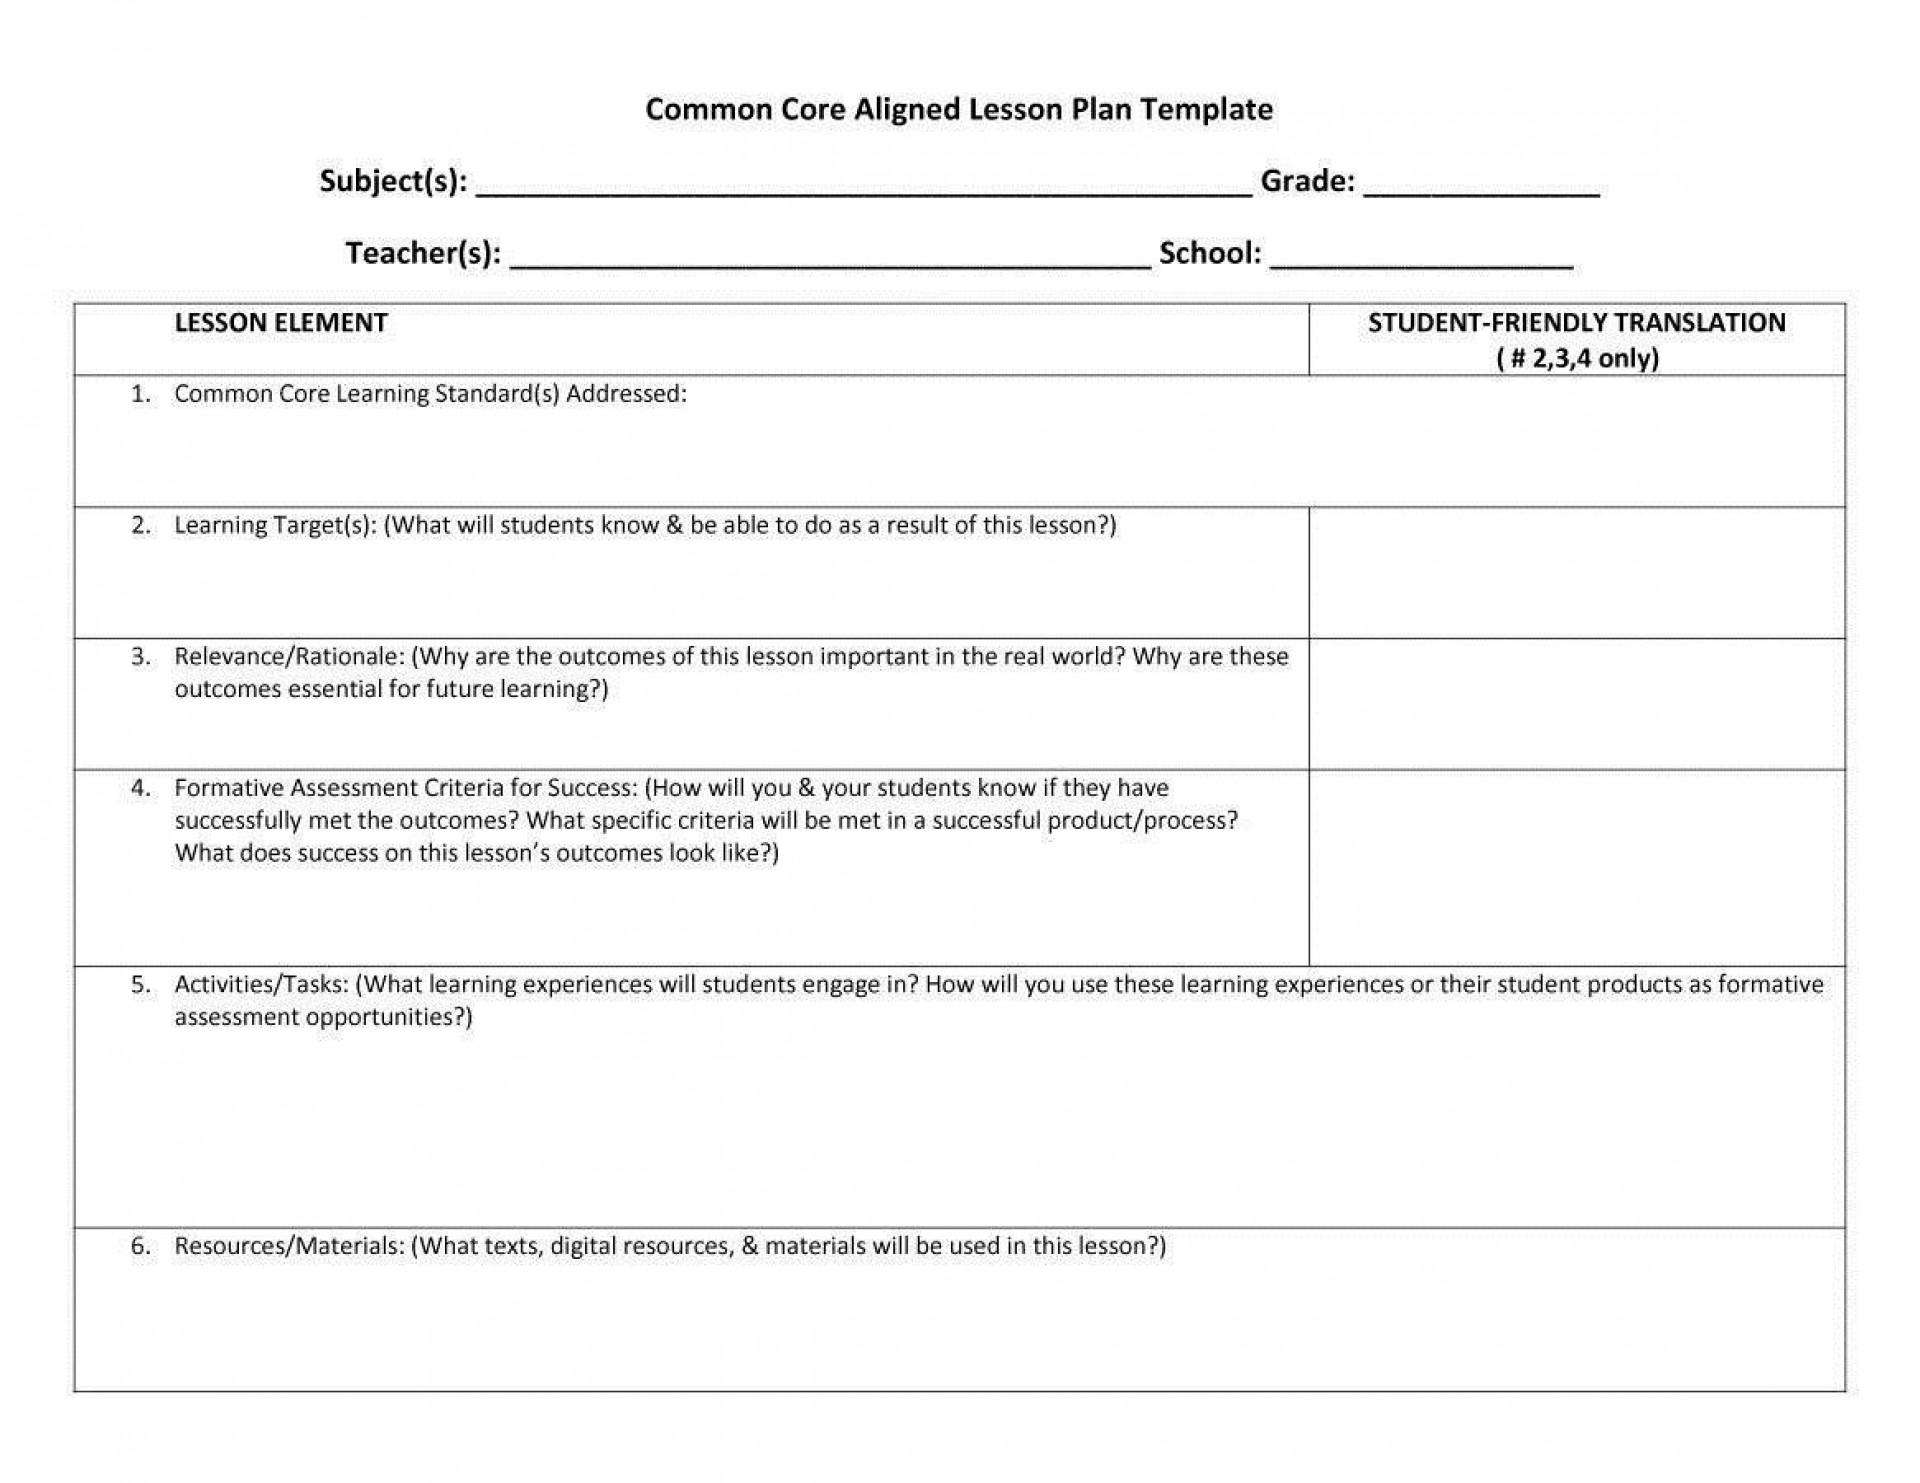 004 Impressive Free Lesson Plan Template Photo  Templates Editable For Preschool Google Doc1920